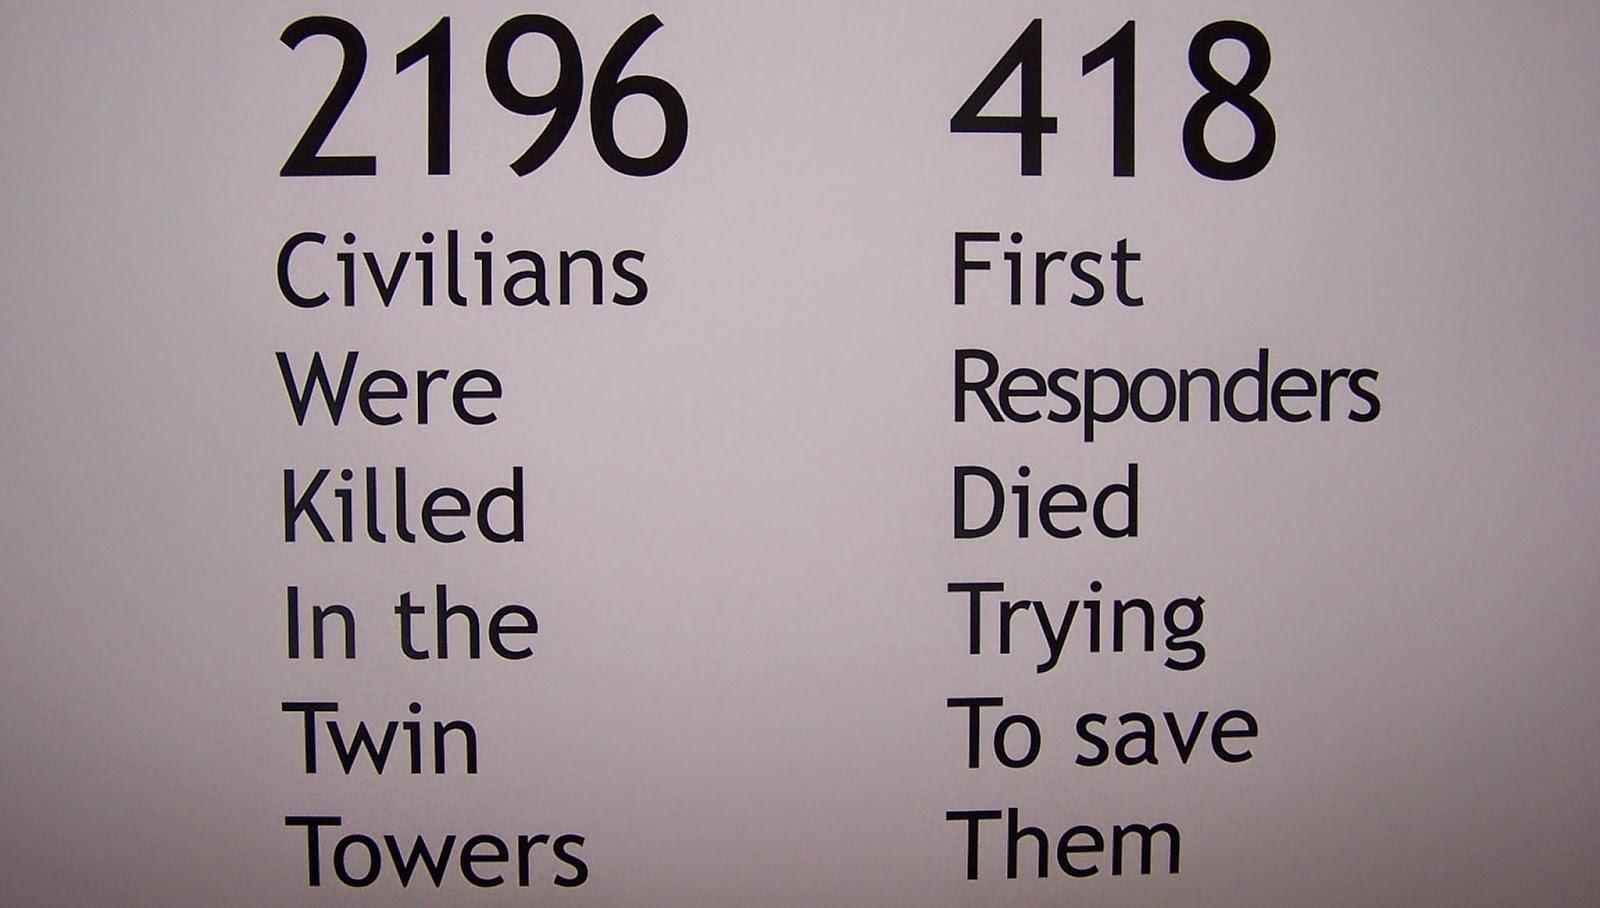 sept 11 stats